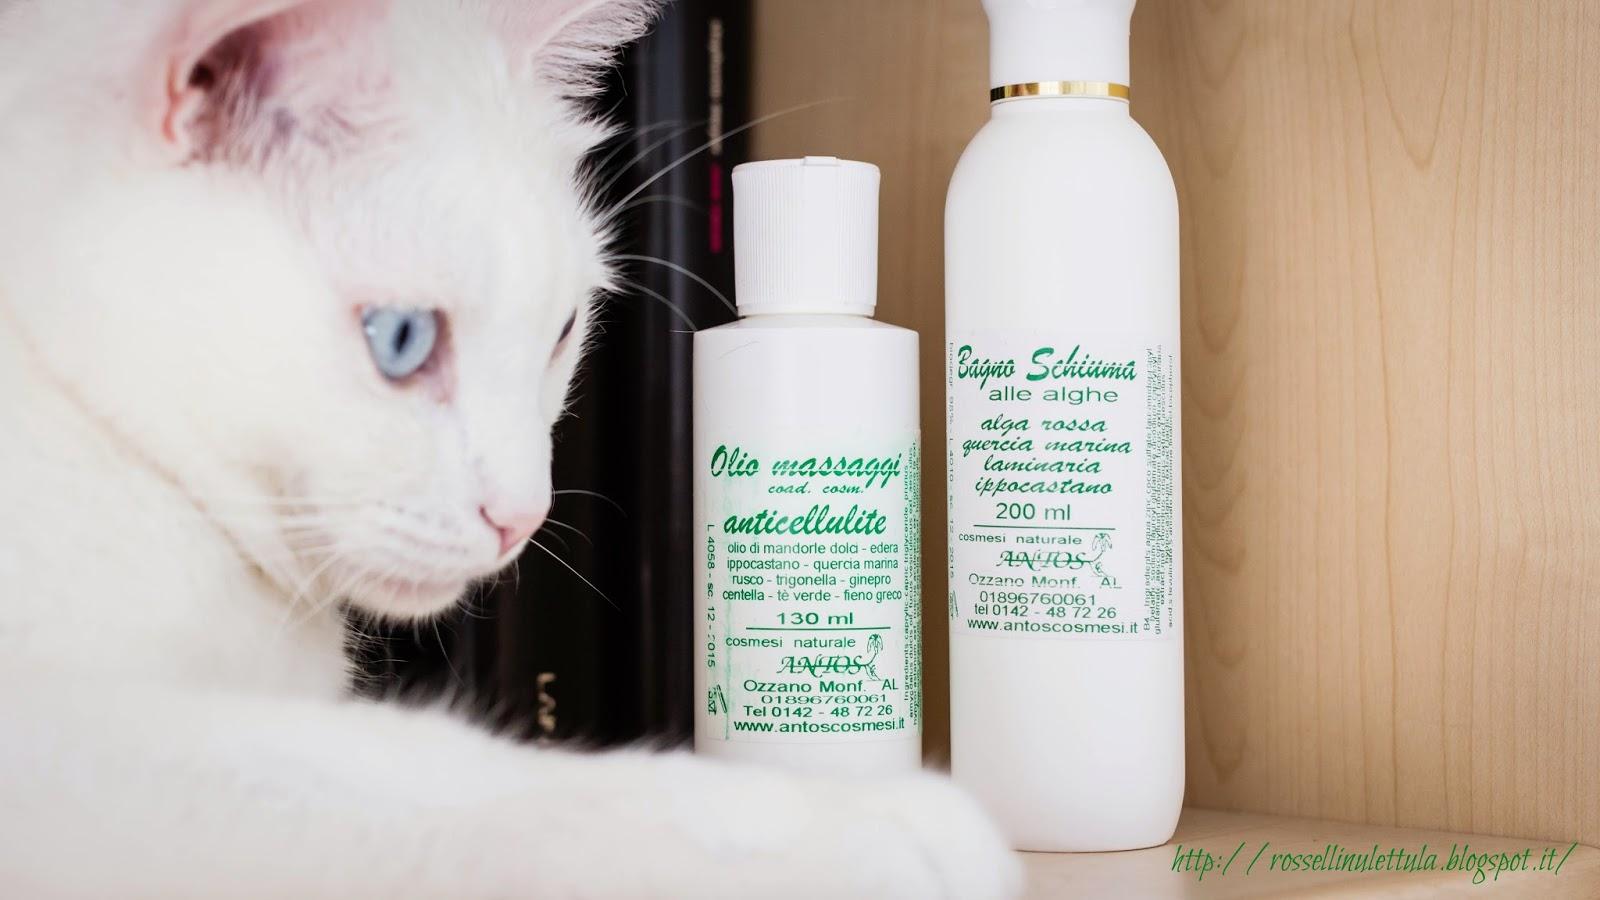 Antos: i miei prodotti anticellulite